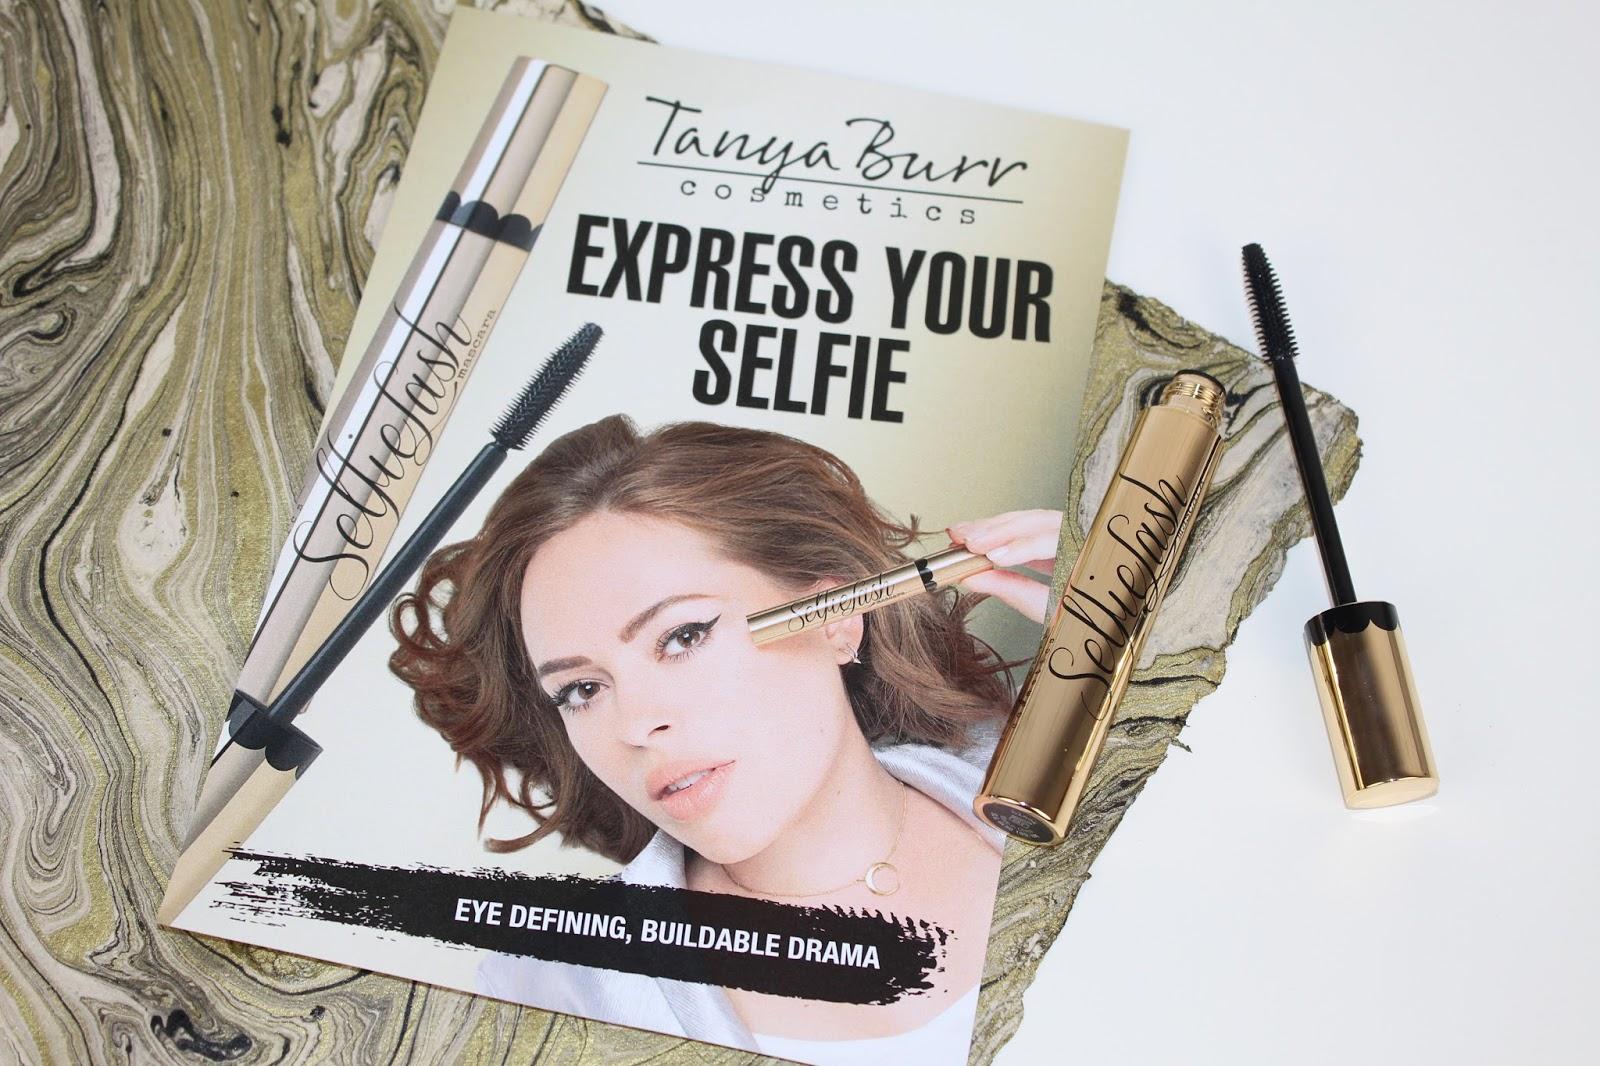 Tanya Burr Selfie Lash Mascara Review and Photos